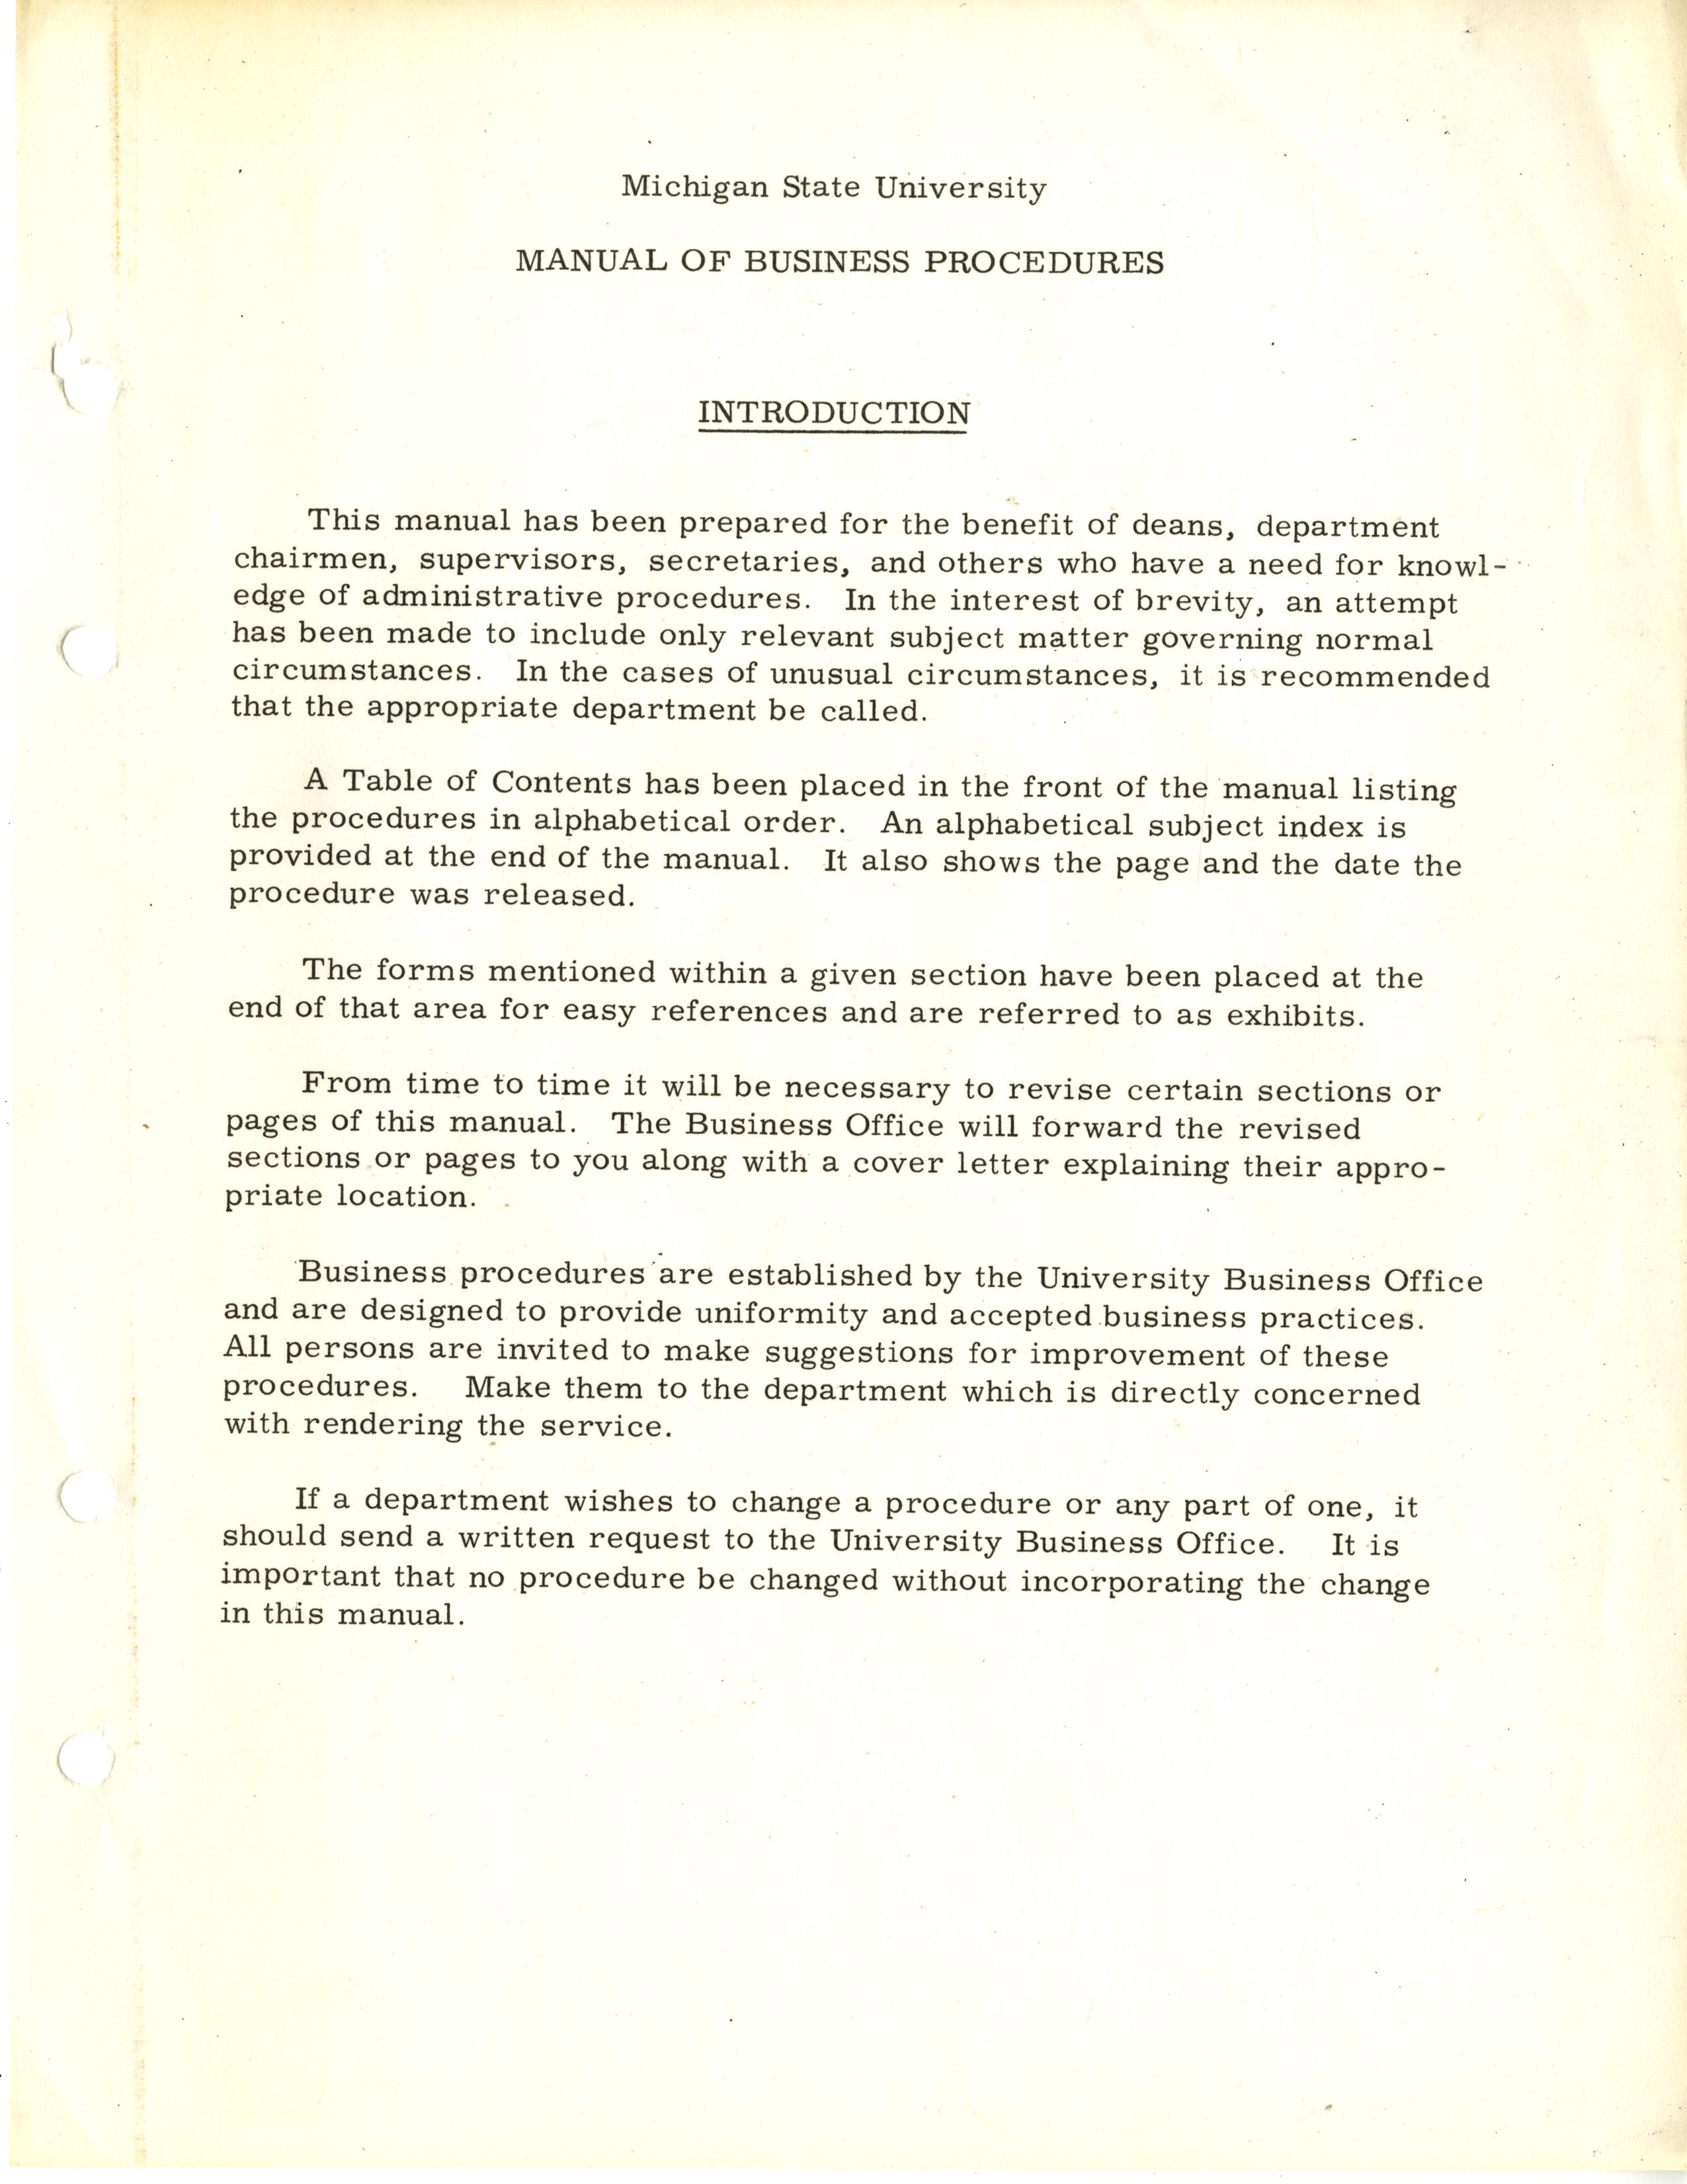 MSU Manual of Business Procedures, 1973